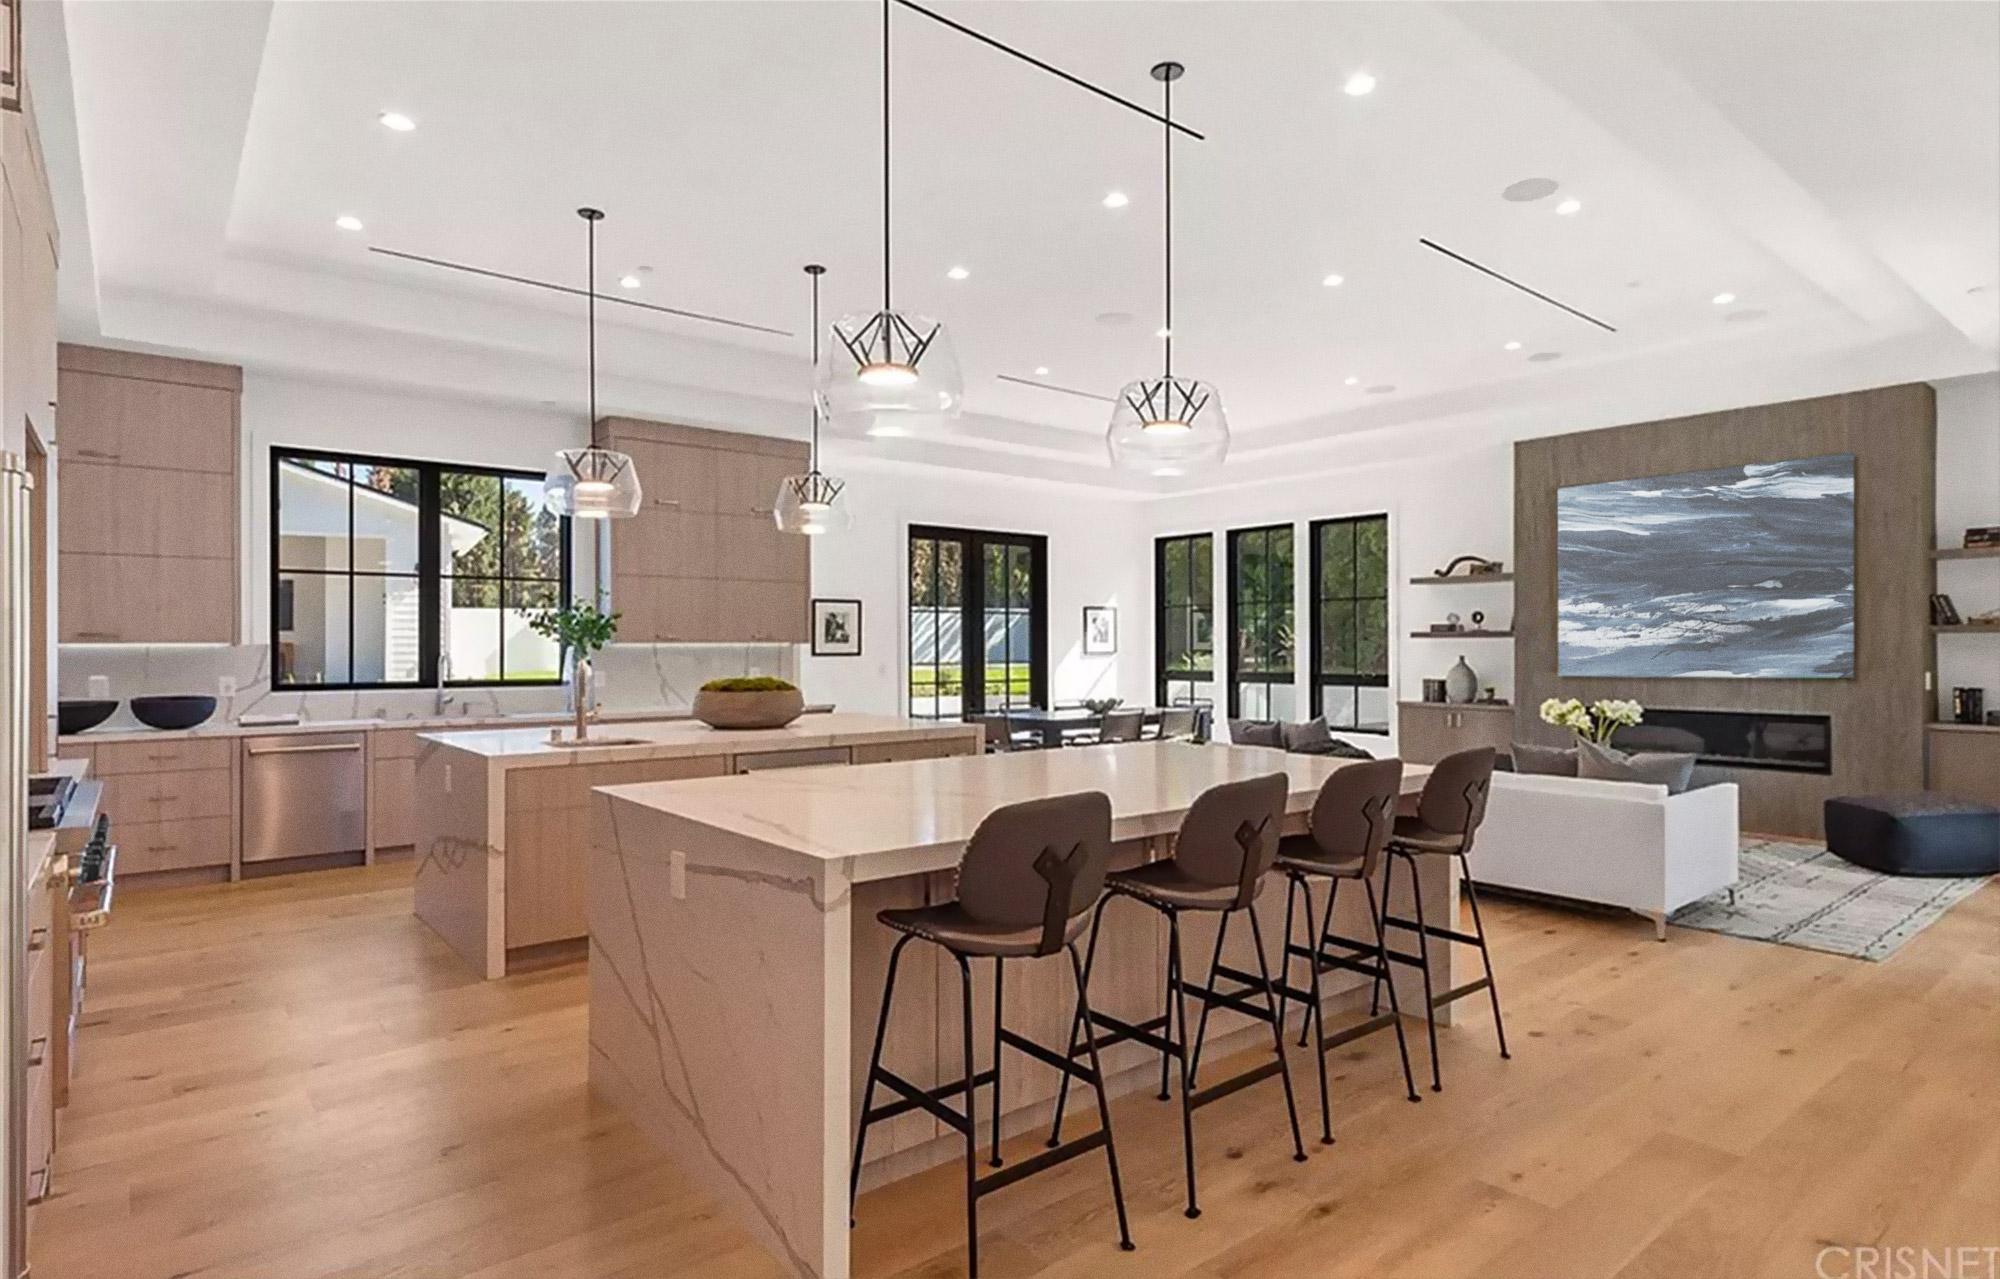 0casa-wood-floors-engineered-wood.jpgcasa-wood-floors-engineered-wood.jpg